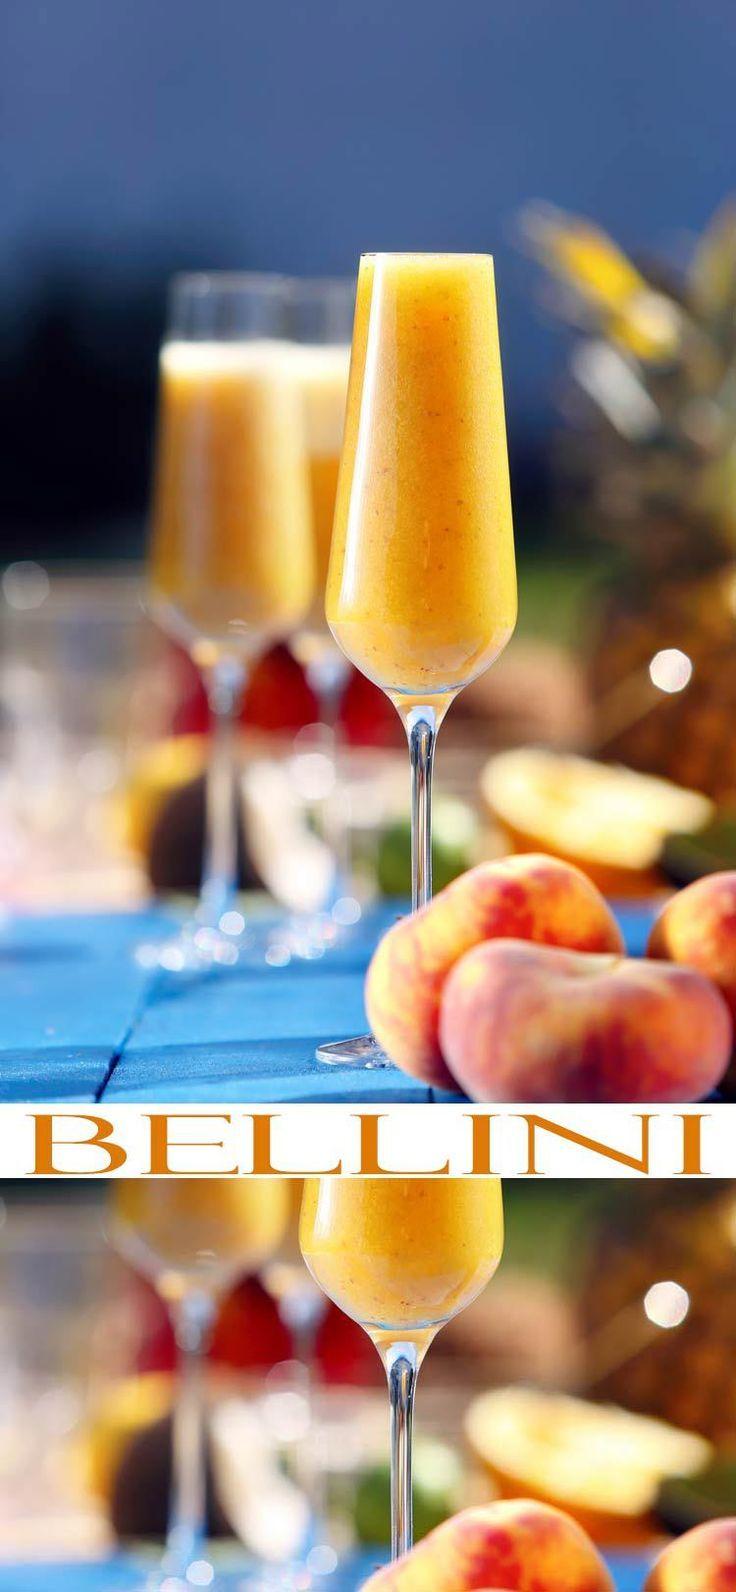 Simple Cocktail Recipes. Bellini Cocktail Recipe. This